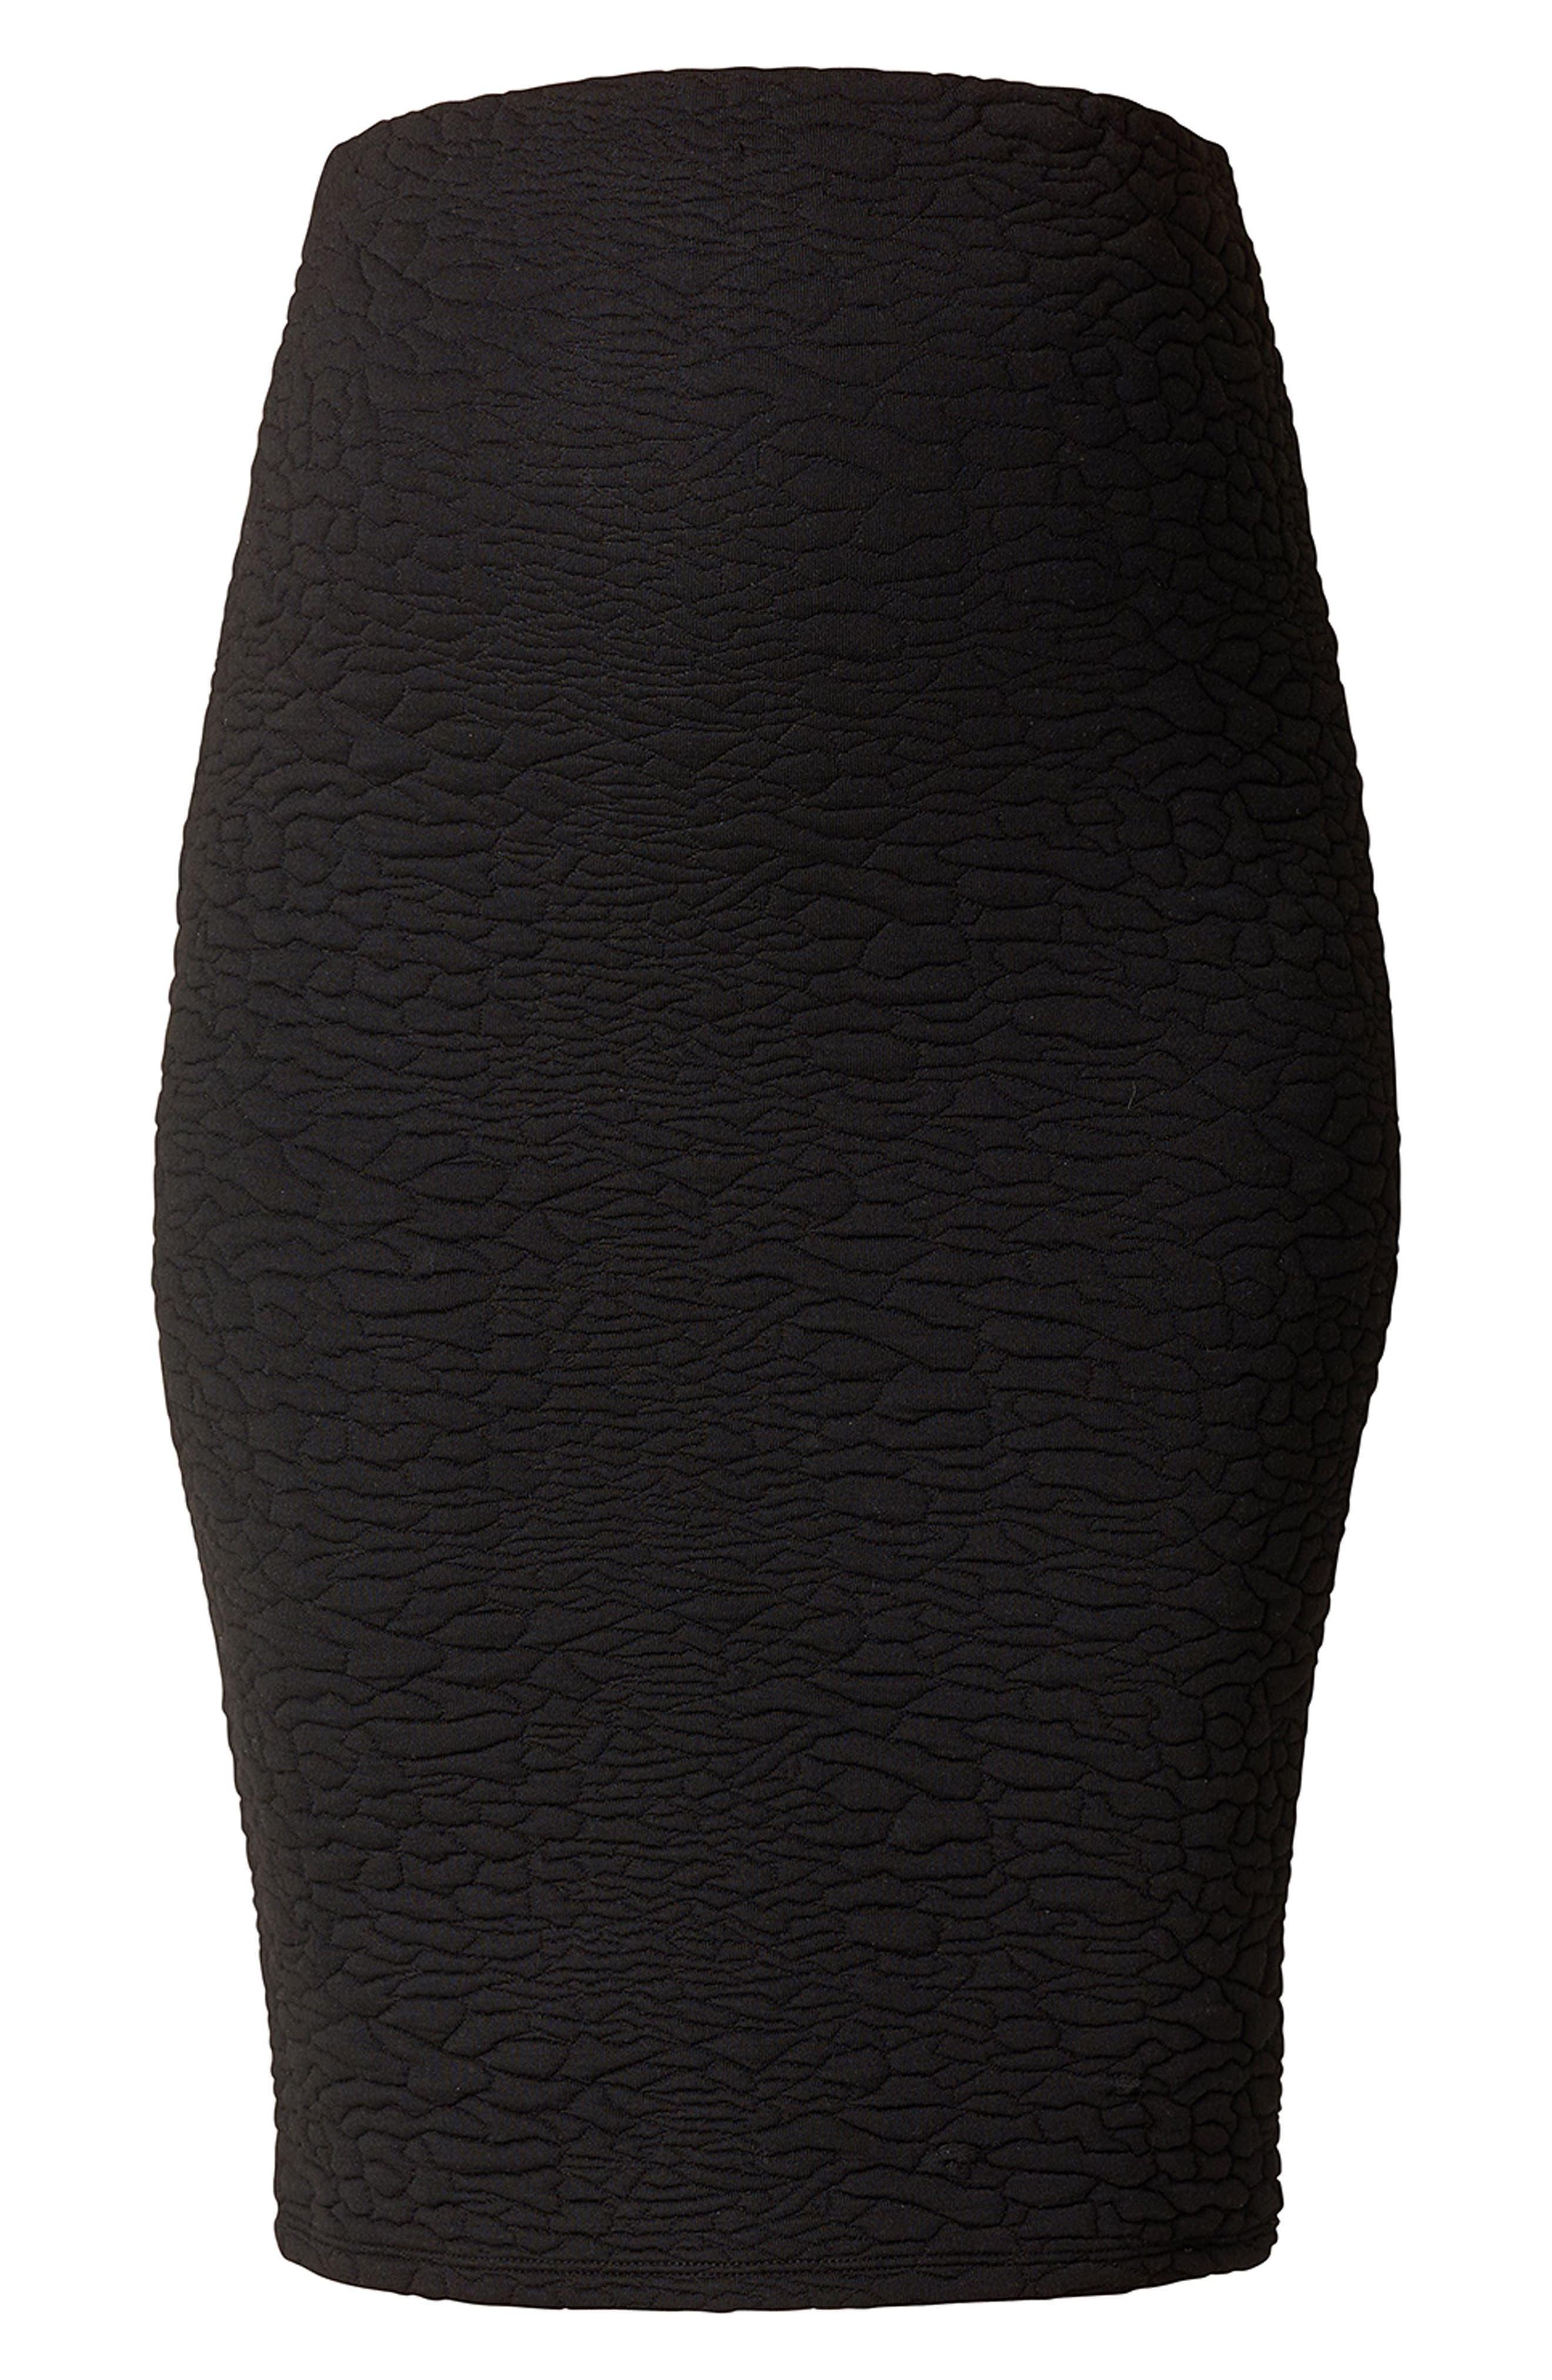 Jane Textured Knit Maternity Skirt,                         Main,                         color, BLACK